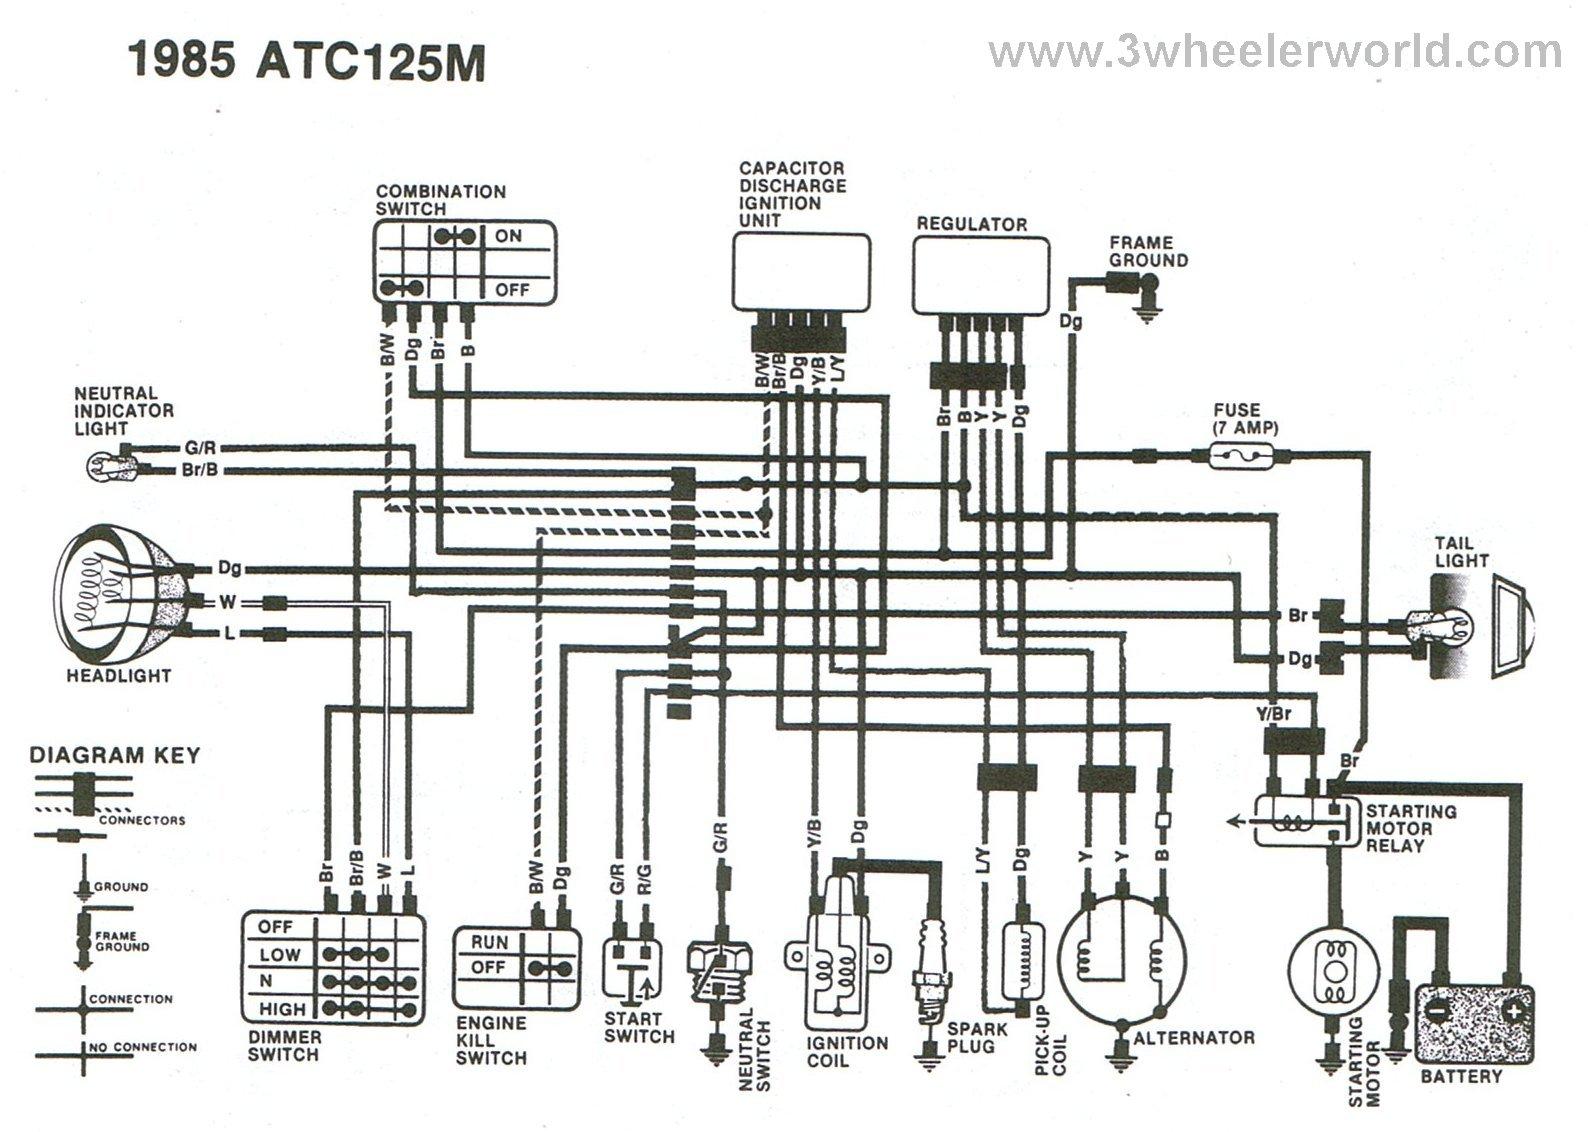 ATC125Mx85?resize=665%2C474 1987 honda 125 fourtrax wiring diagram wiring diagram,1986 Honda Trx 125 Wiring Diagram